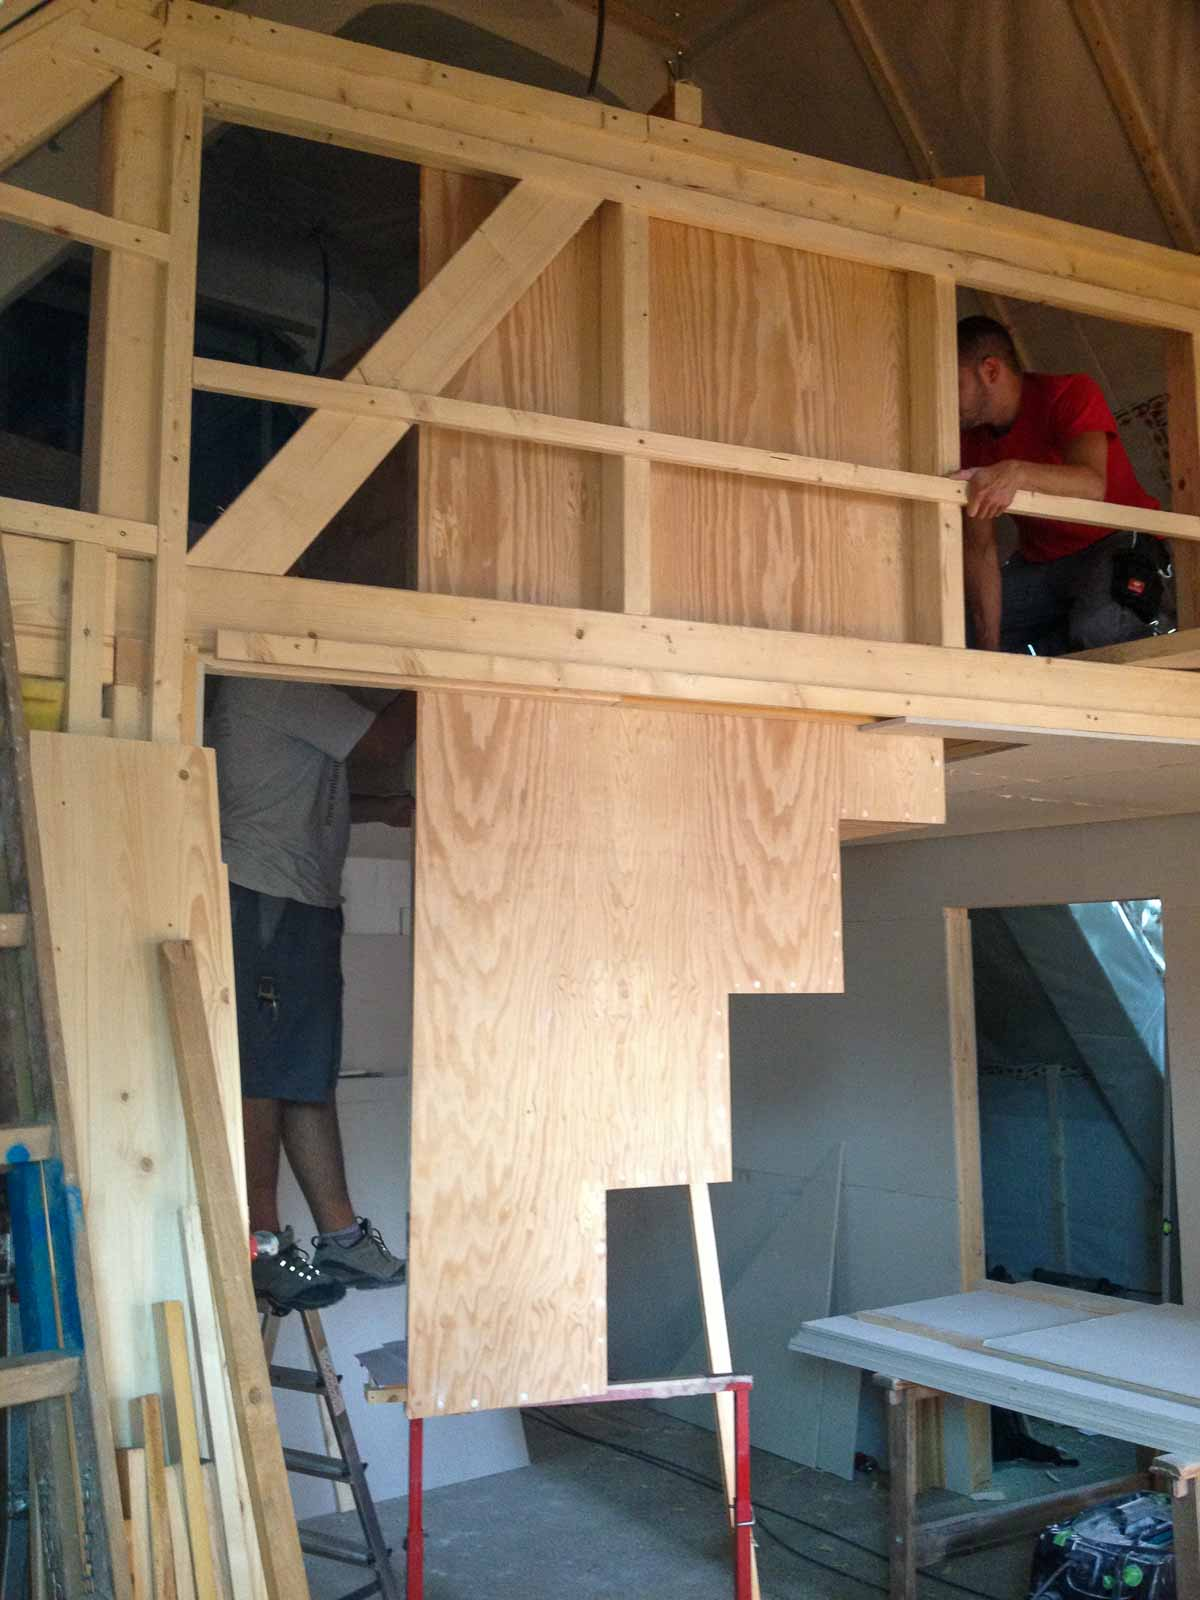 Wooddesign_Holzdesign_Treppe_Holztreppe_schwebend_2-teilig_atelierducret_freiburg(7)